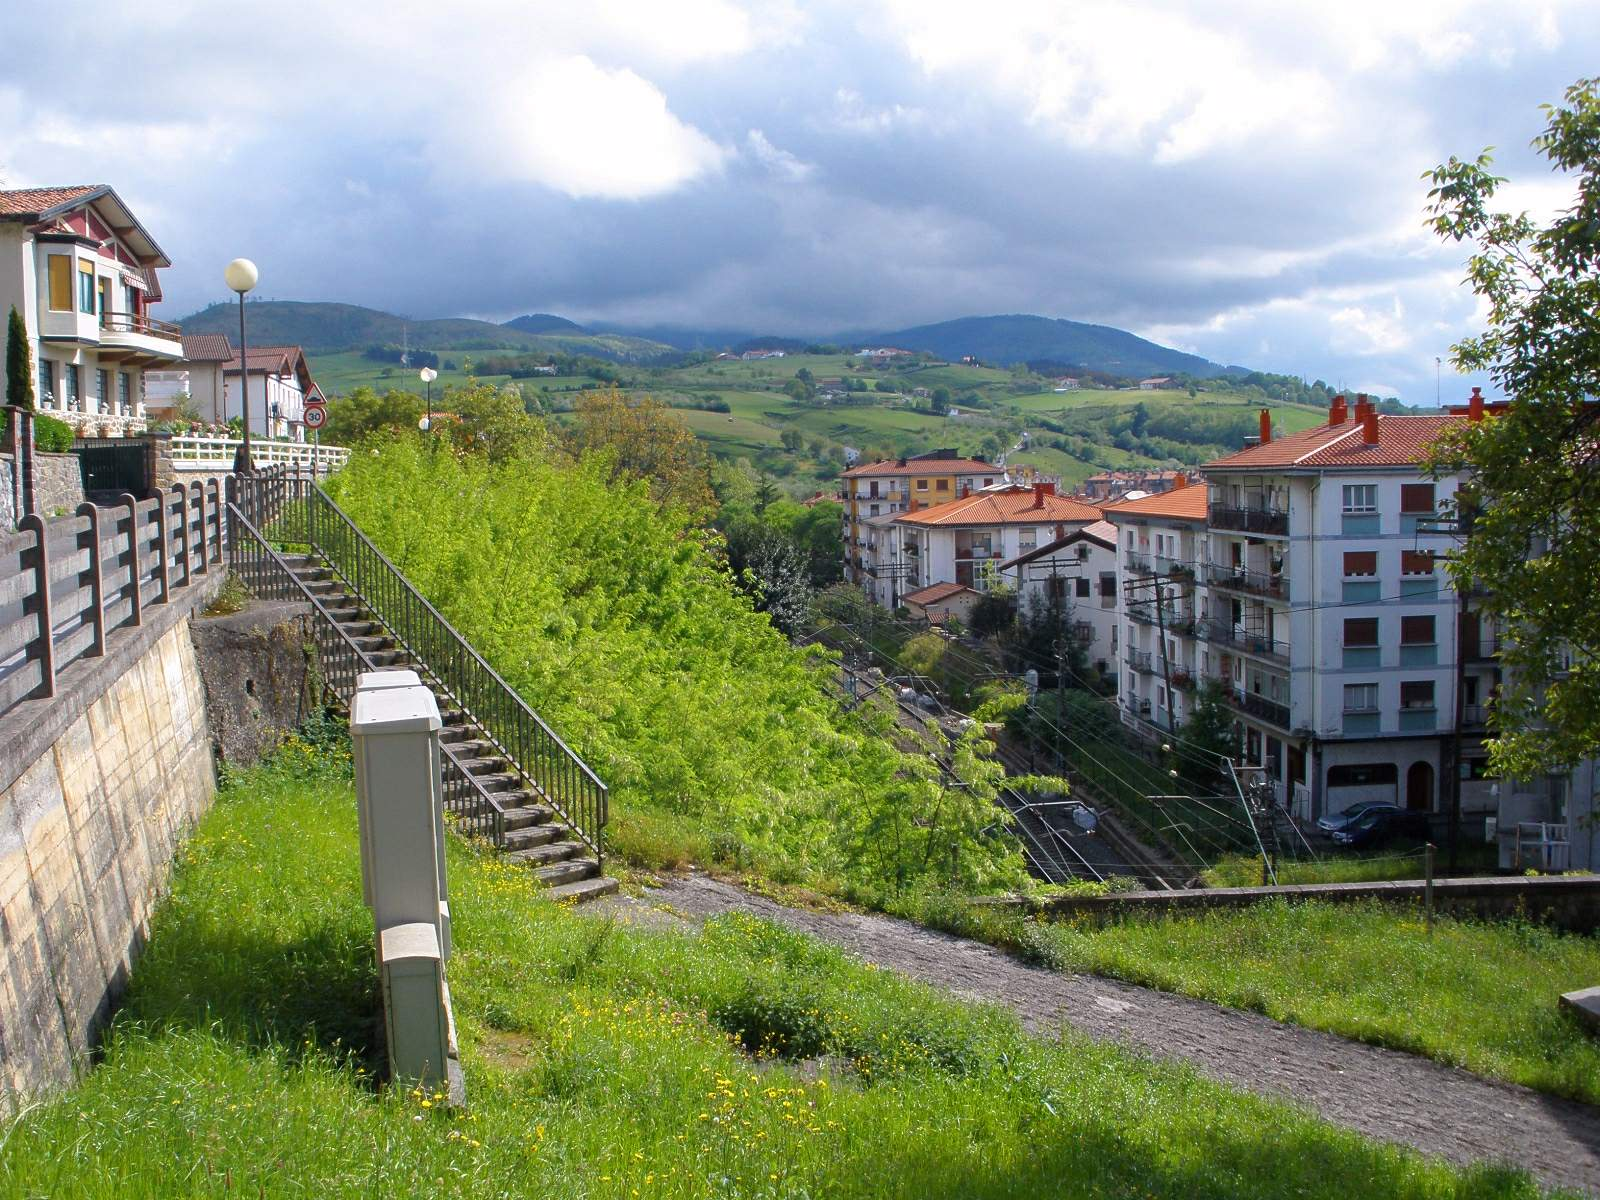 File:Andoain 19.jpg - Wikimedia Commons